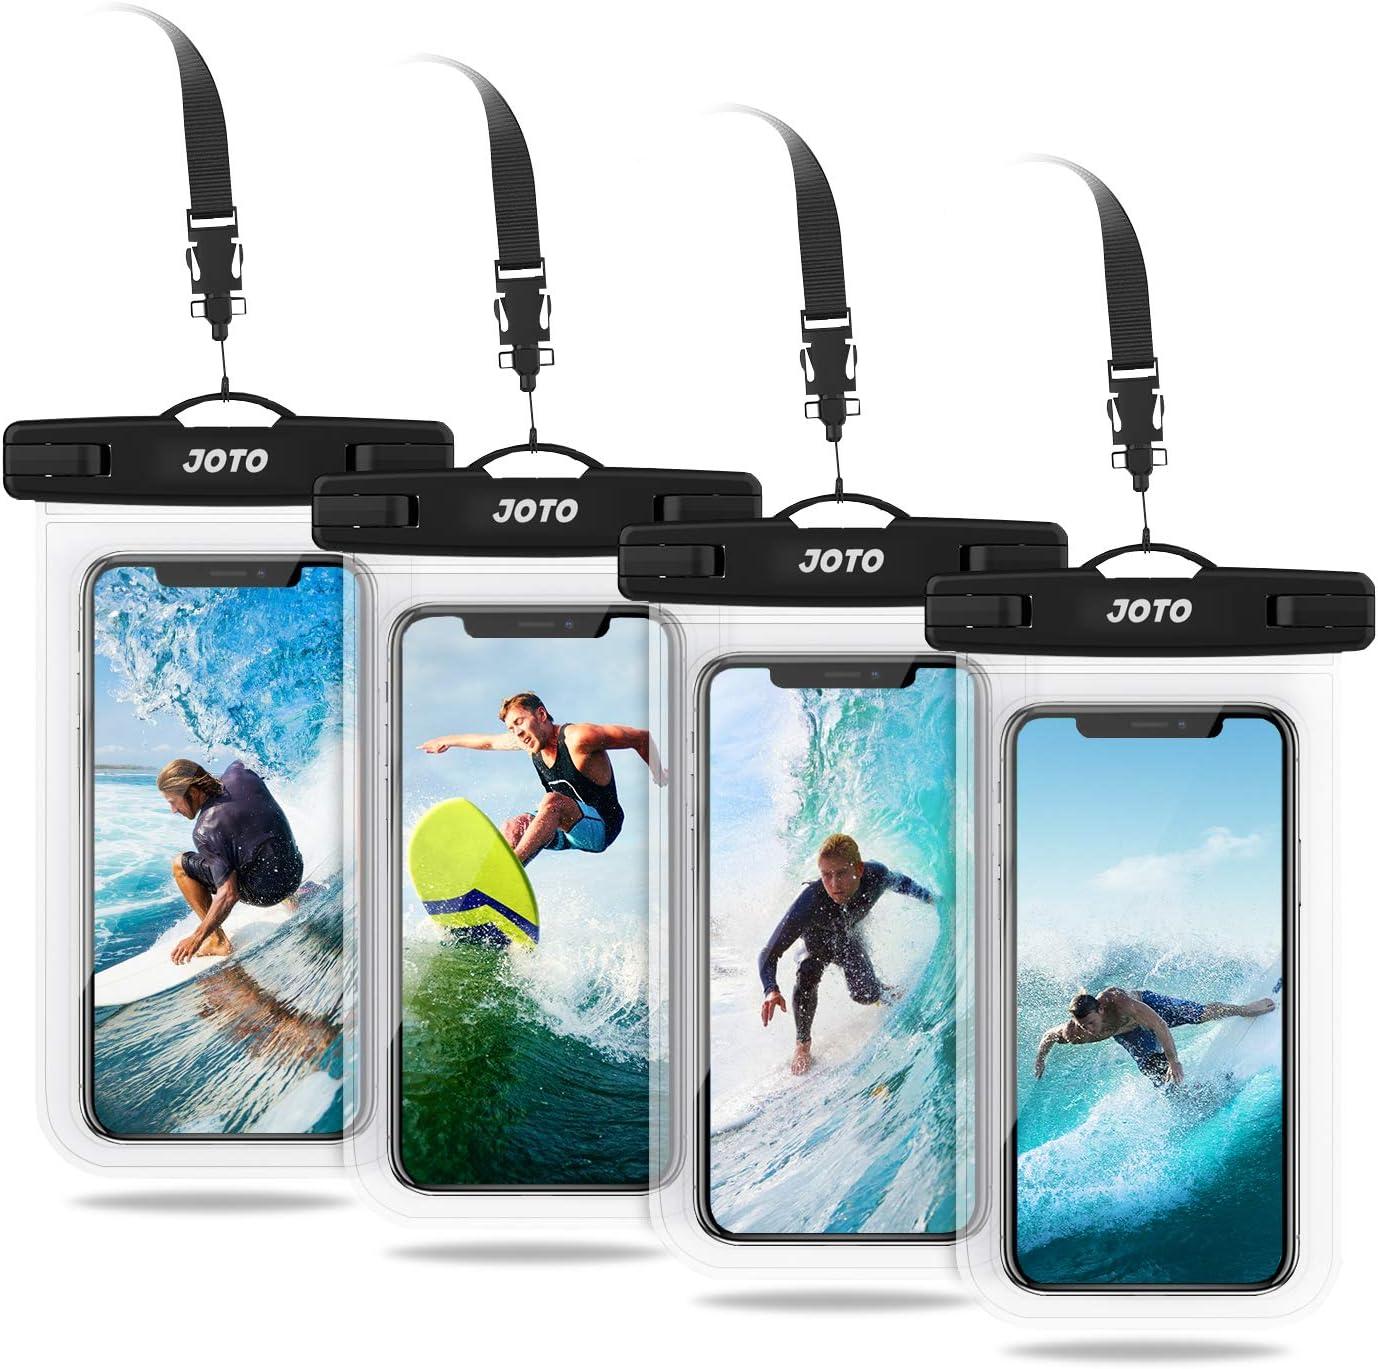 JOTO 4 uds. Bolsa Estanca Móvil Universal, IPX8 Funda Impermeable para iPhone 11 Pro Max/XS/XR/X/8/7+/6S/6S+, Galaxy S20+/S10e/S9/Note10+, Pixel 4, Huawei P30, Xiaomi Redmi Note hasta 6,5